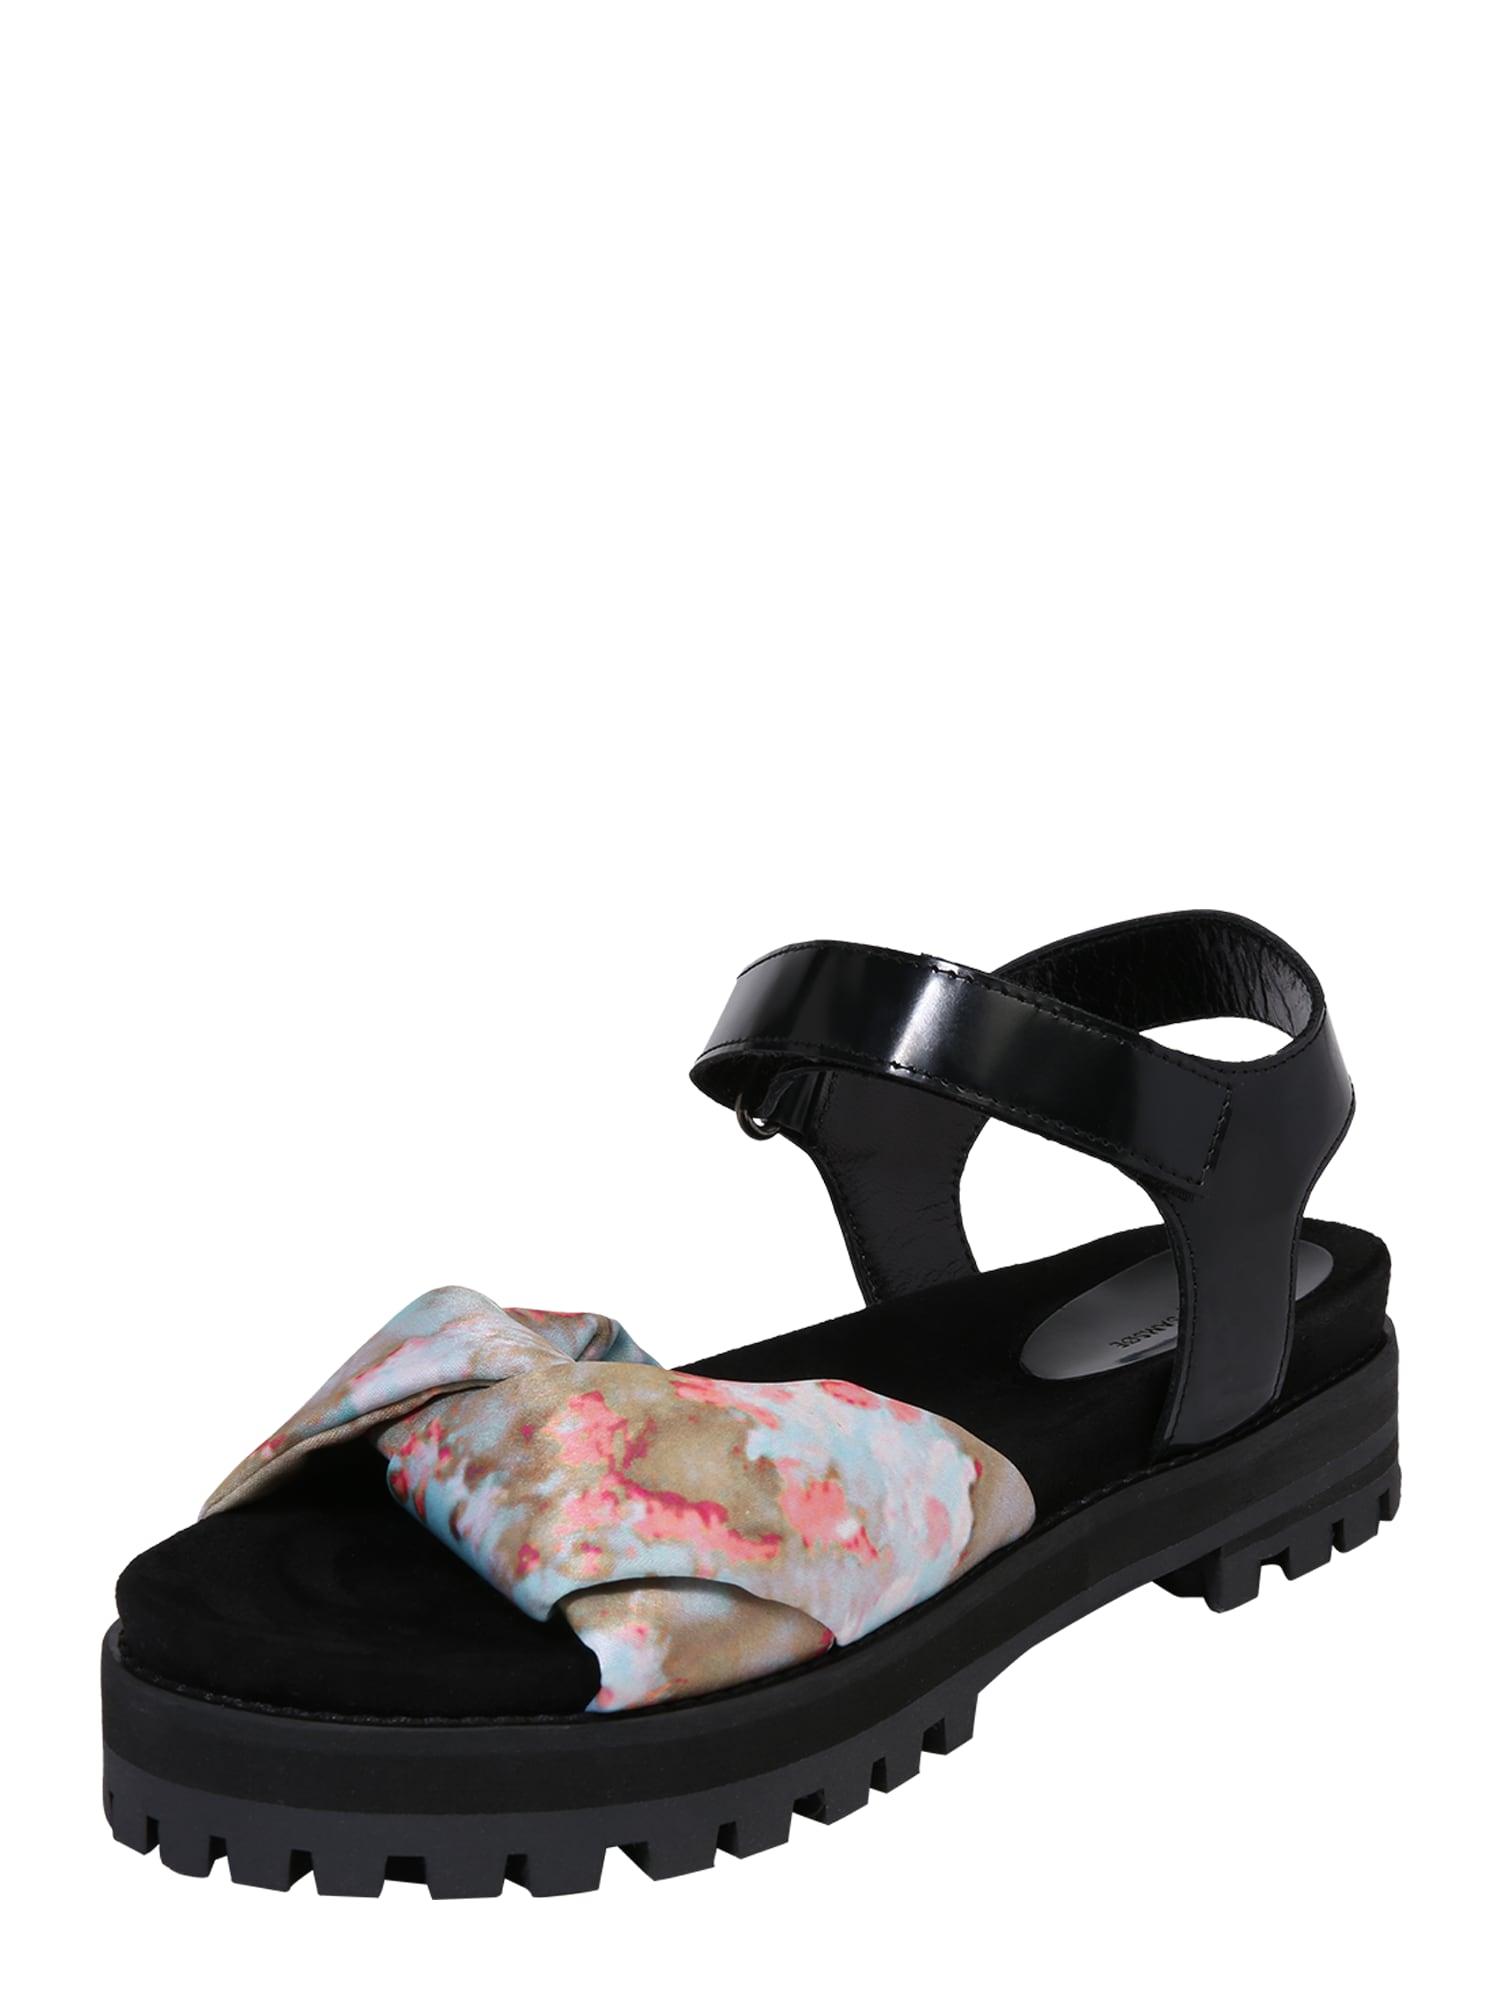 Sandály GRETA  mix barev černá Samsoe & Samsoe